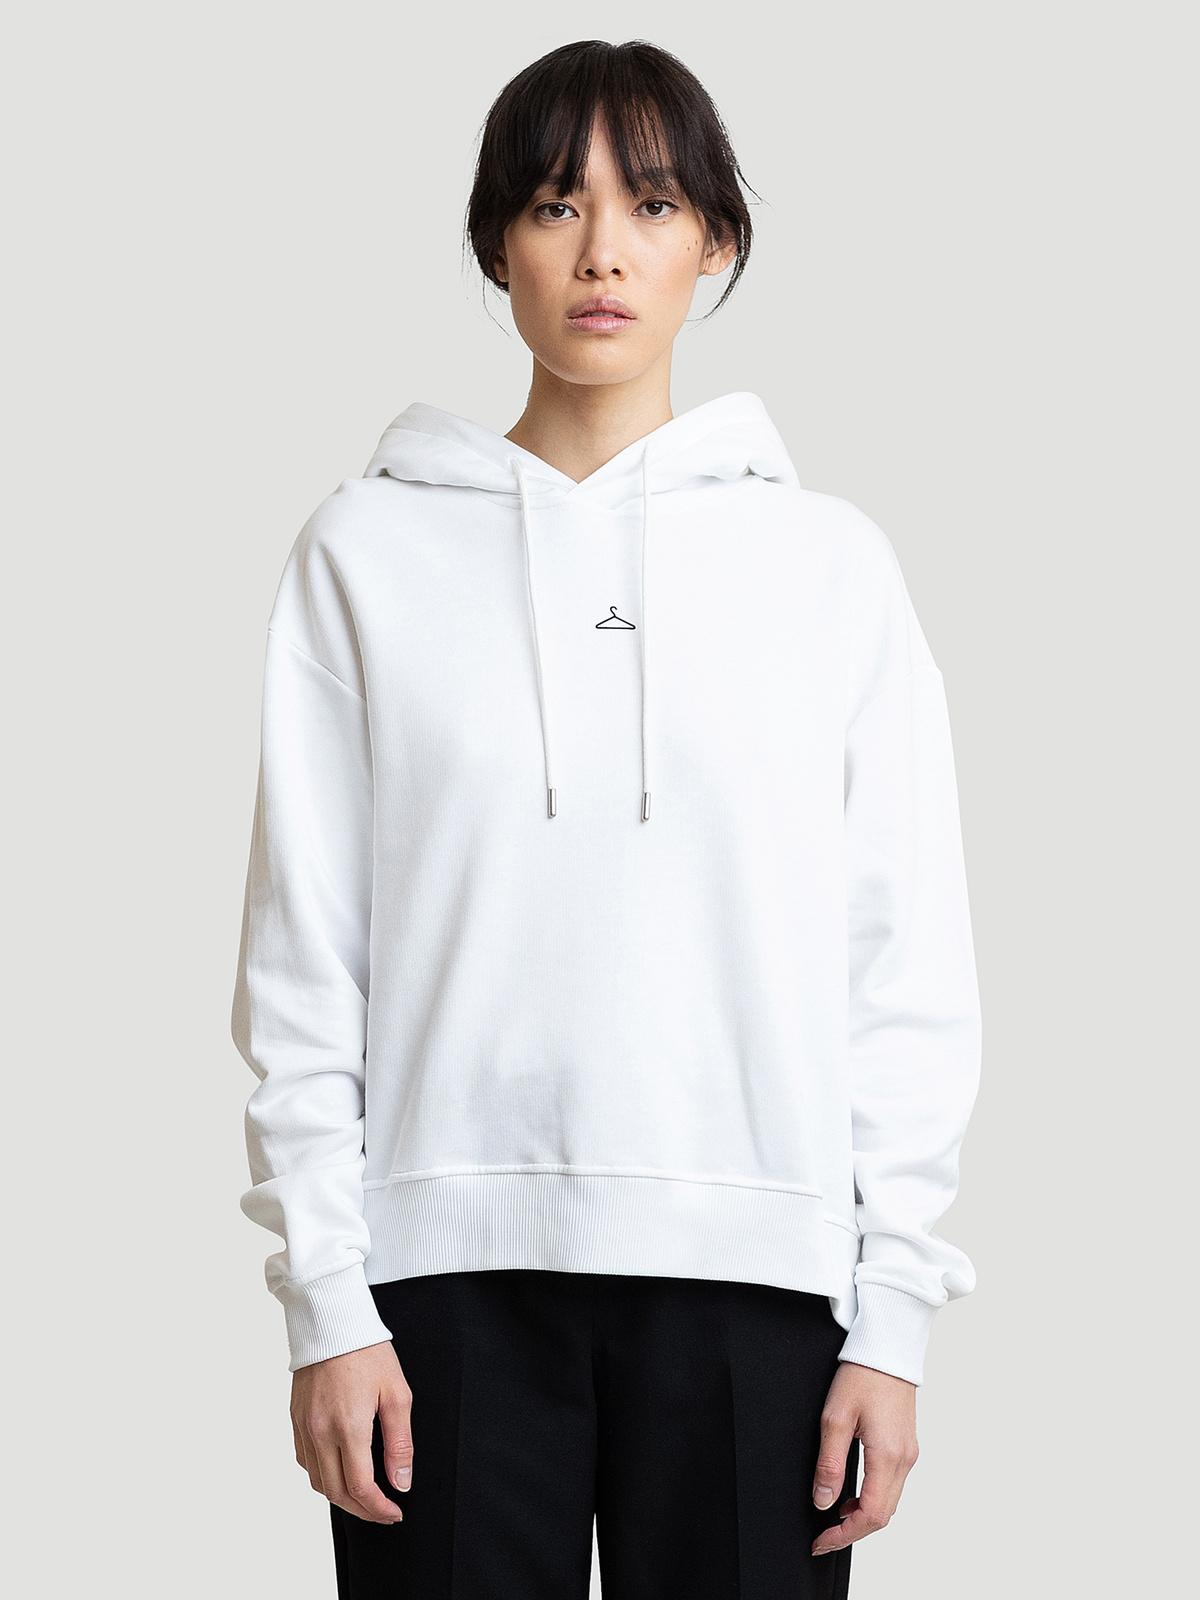 Hanger Hoodie White 0